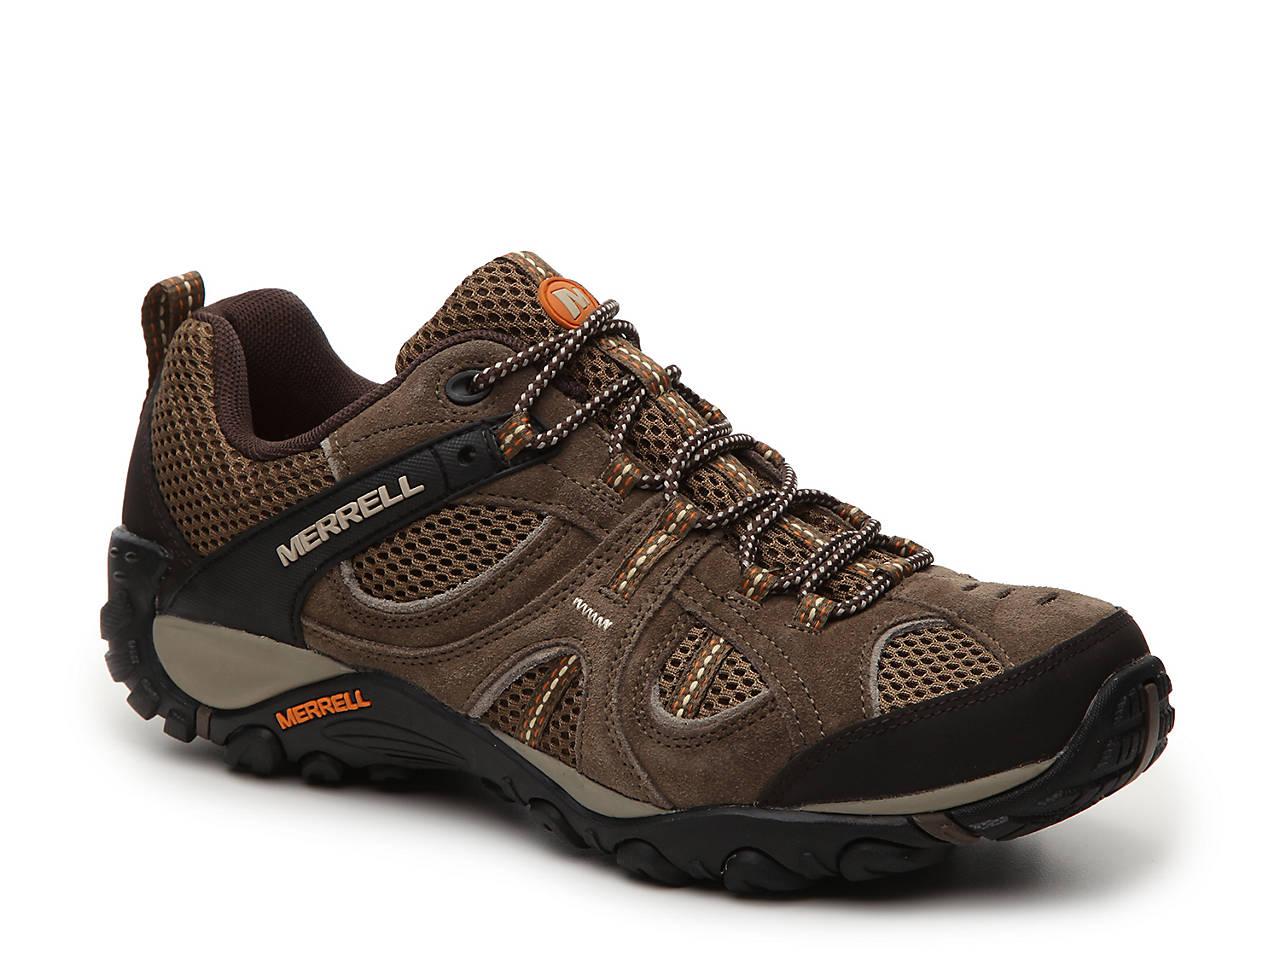 9c4961e3a Yokota Trail Ventilator Hiking Shoe